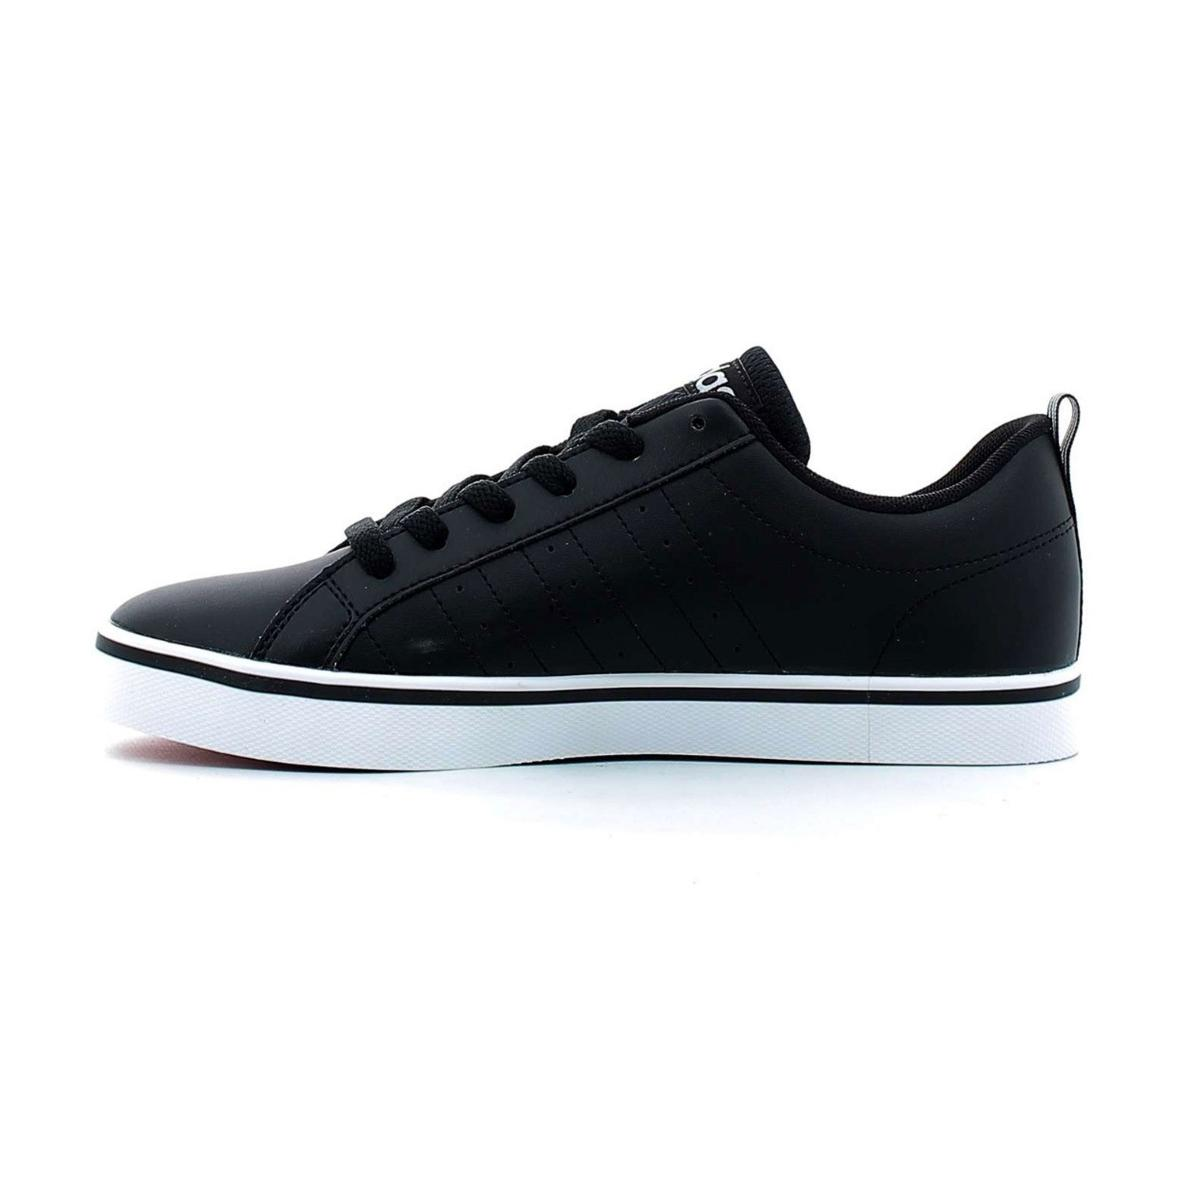 Scarpe Sneakers Adidas VS Pace da uomo rif. B74494